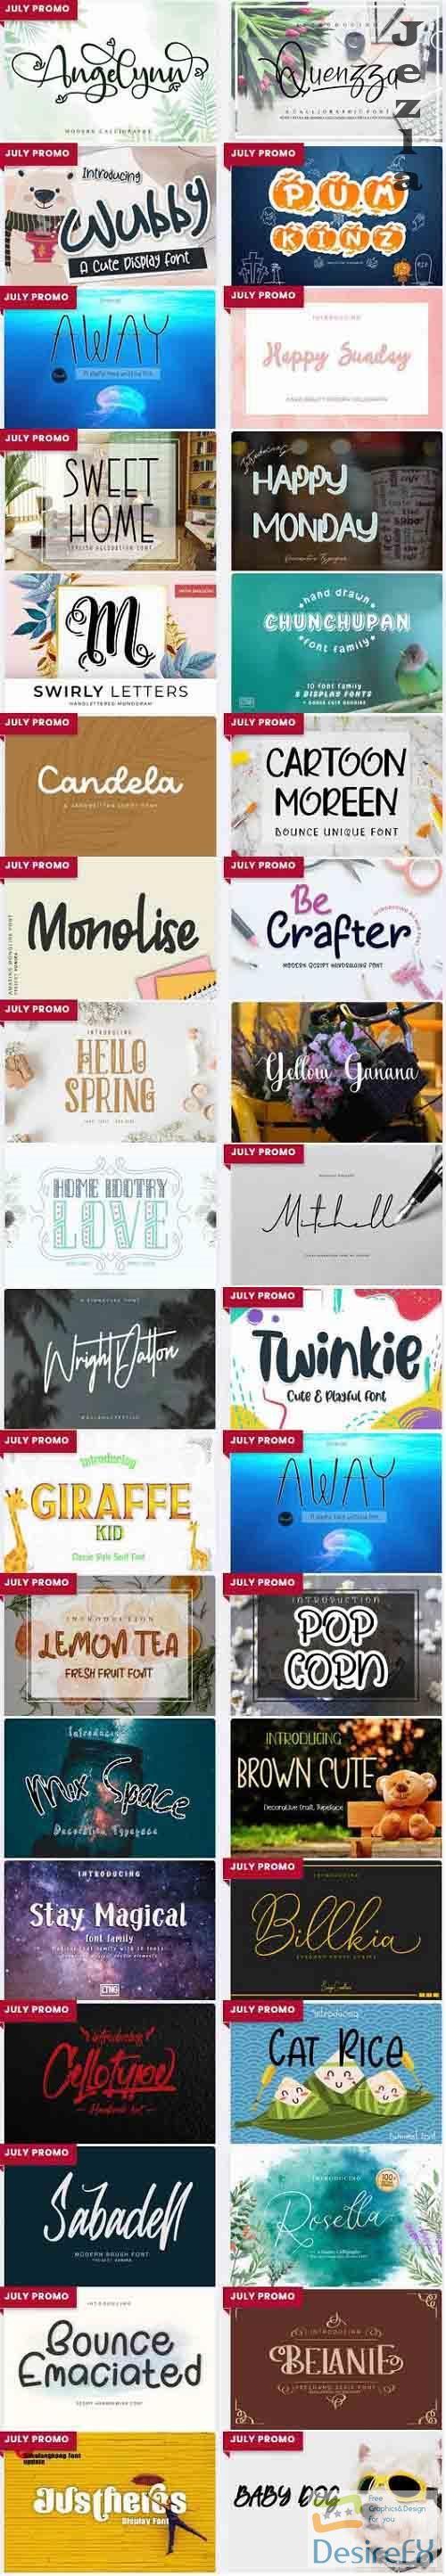 Mix Font Bundle 6 - 36 Premium Fonts